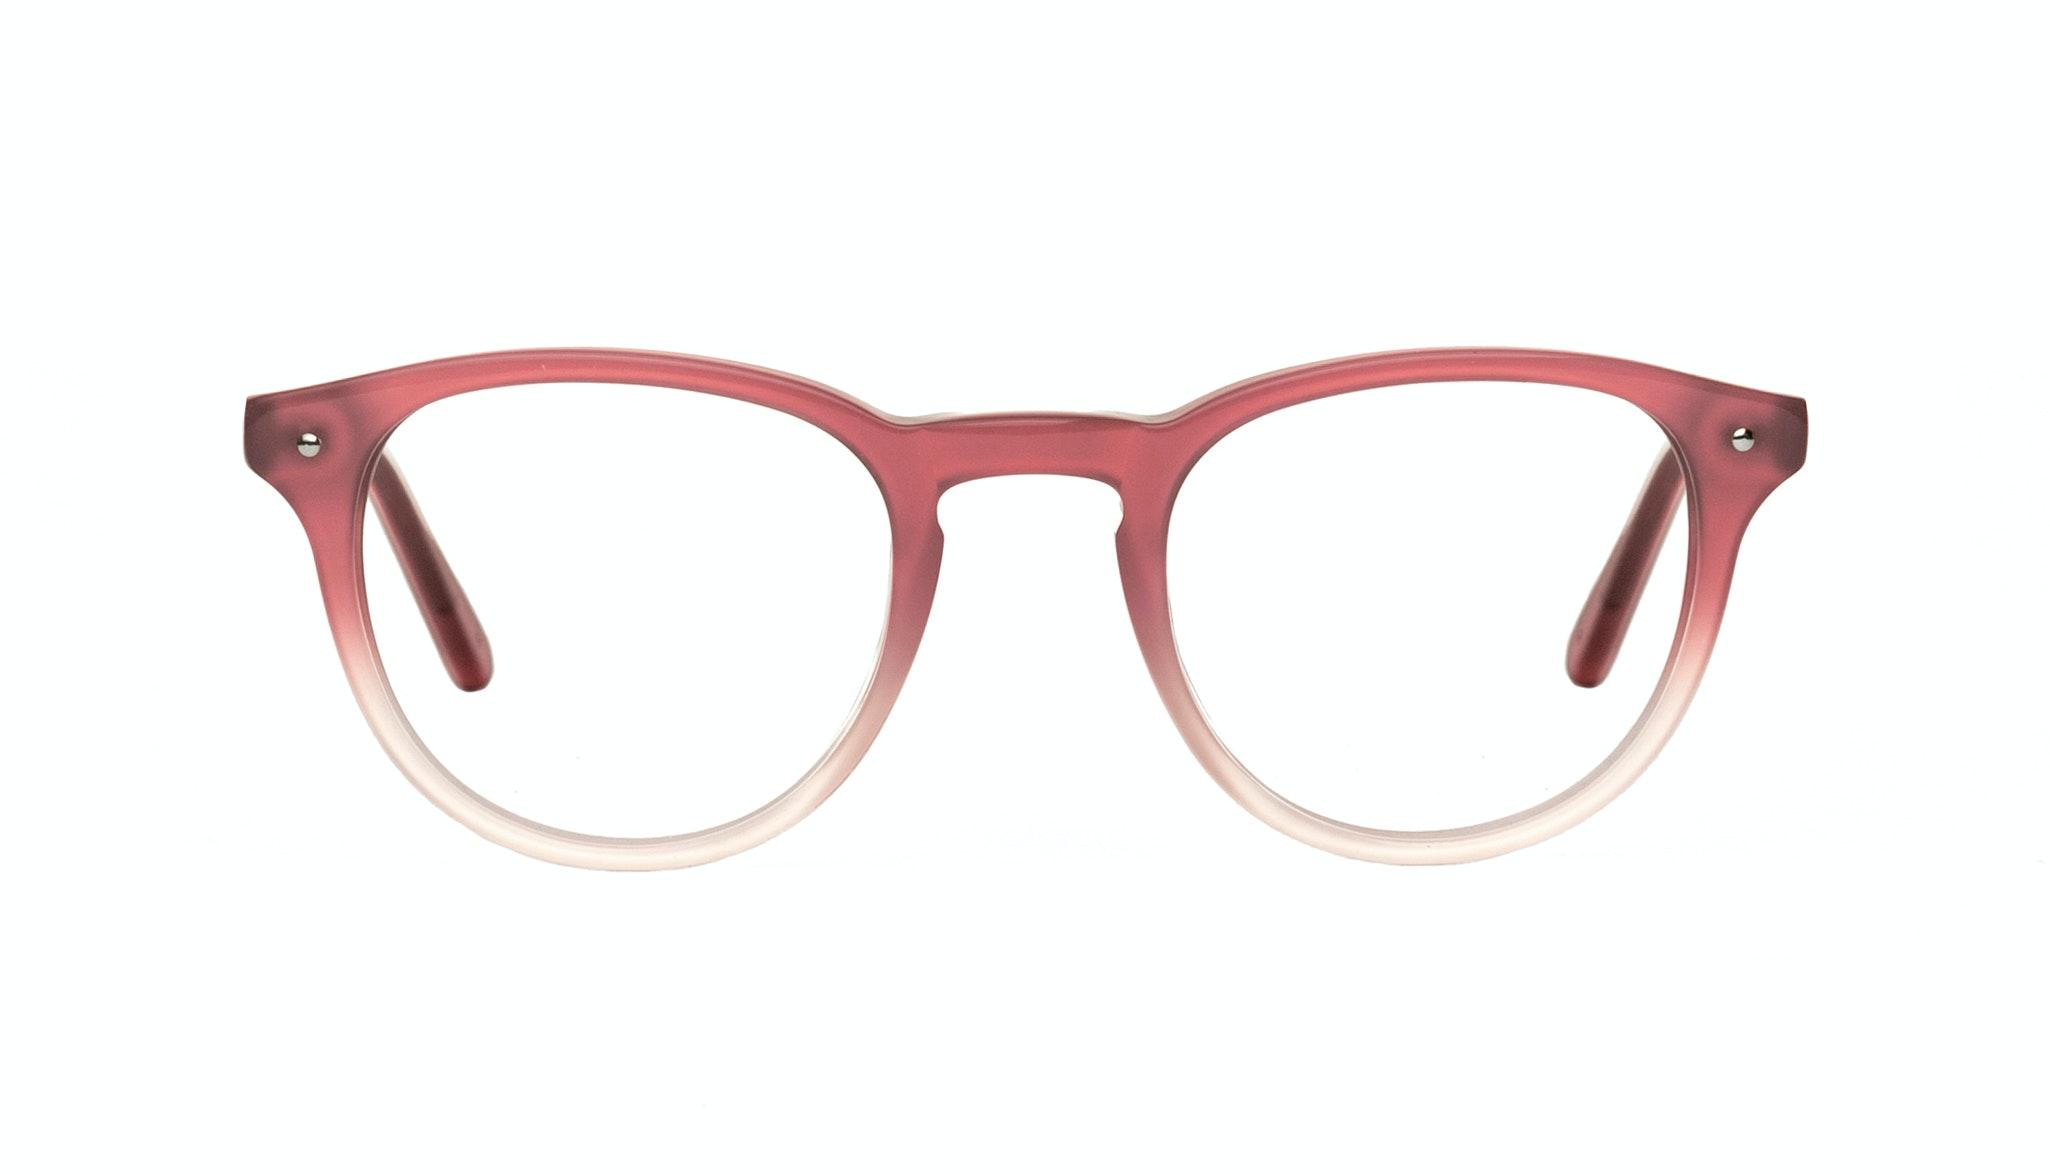 Affordable Fashion Glasses Round Eyeglasses Men Women Cult Rose Quartz